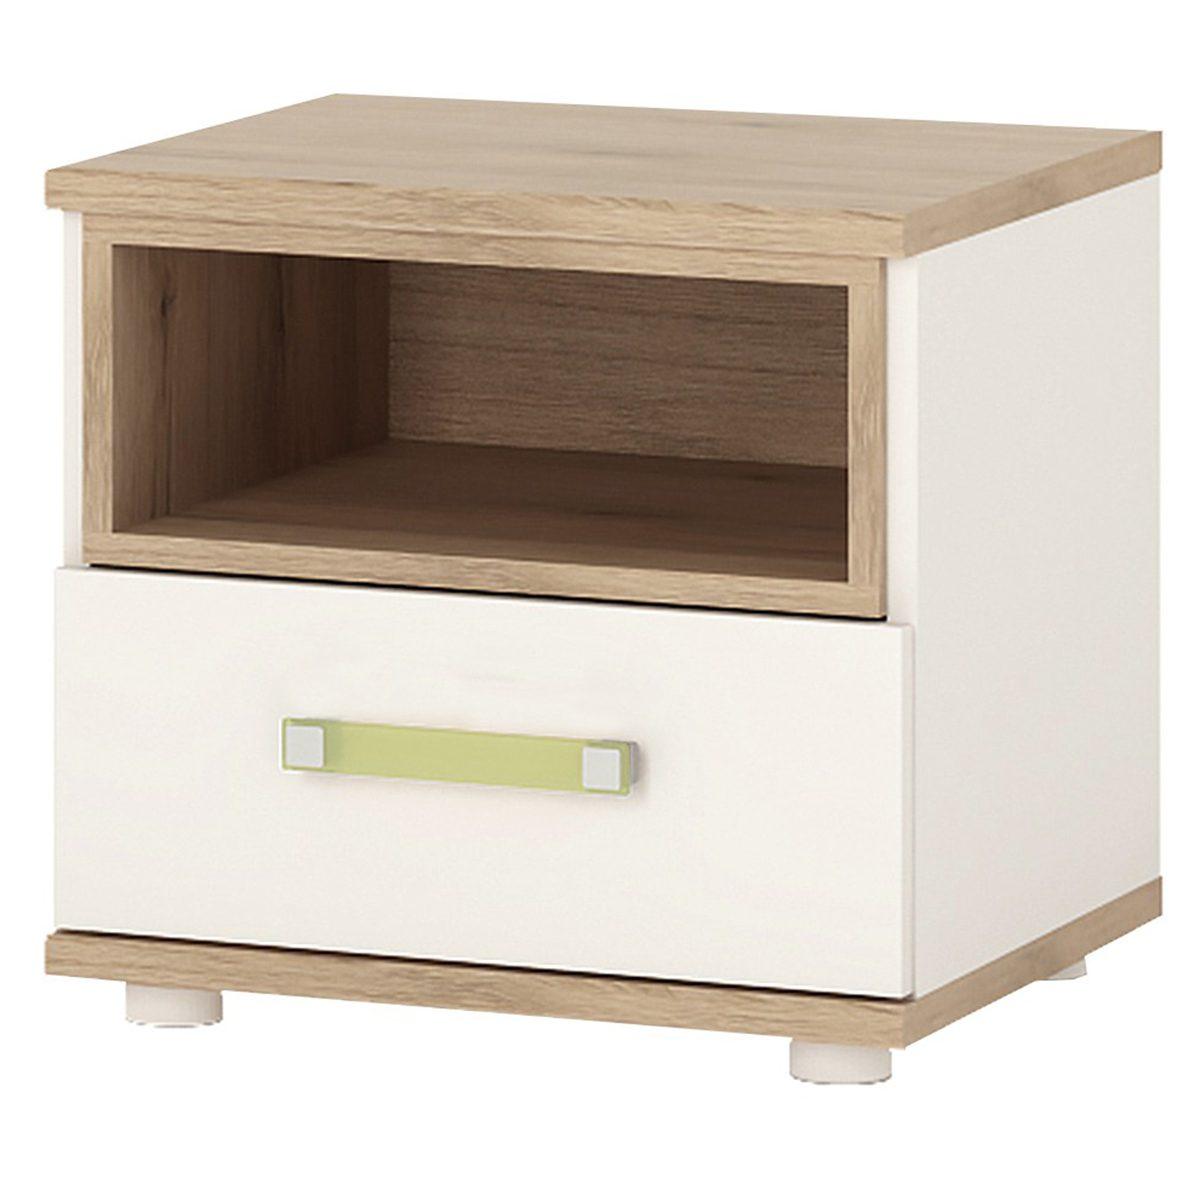 iKids 1 Drawer Bedside Cabinet with Lemon Coloured Handle